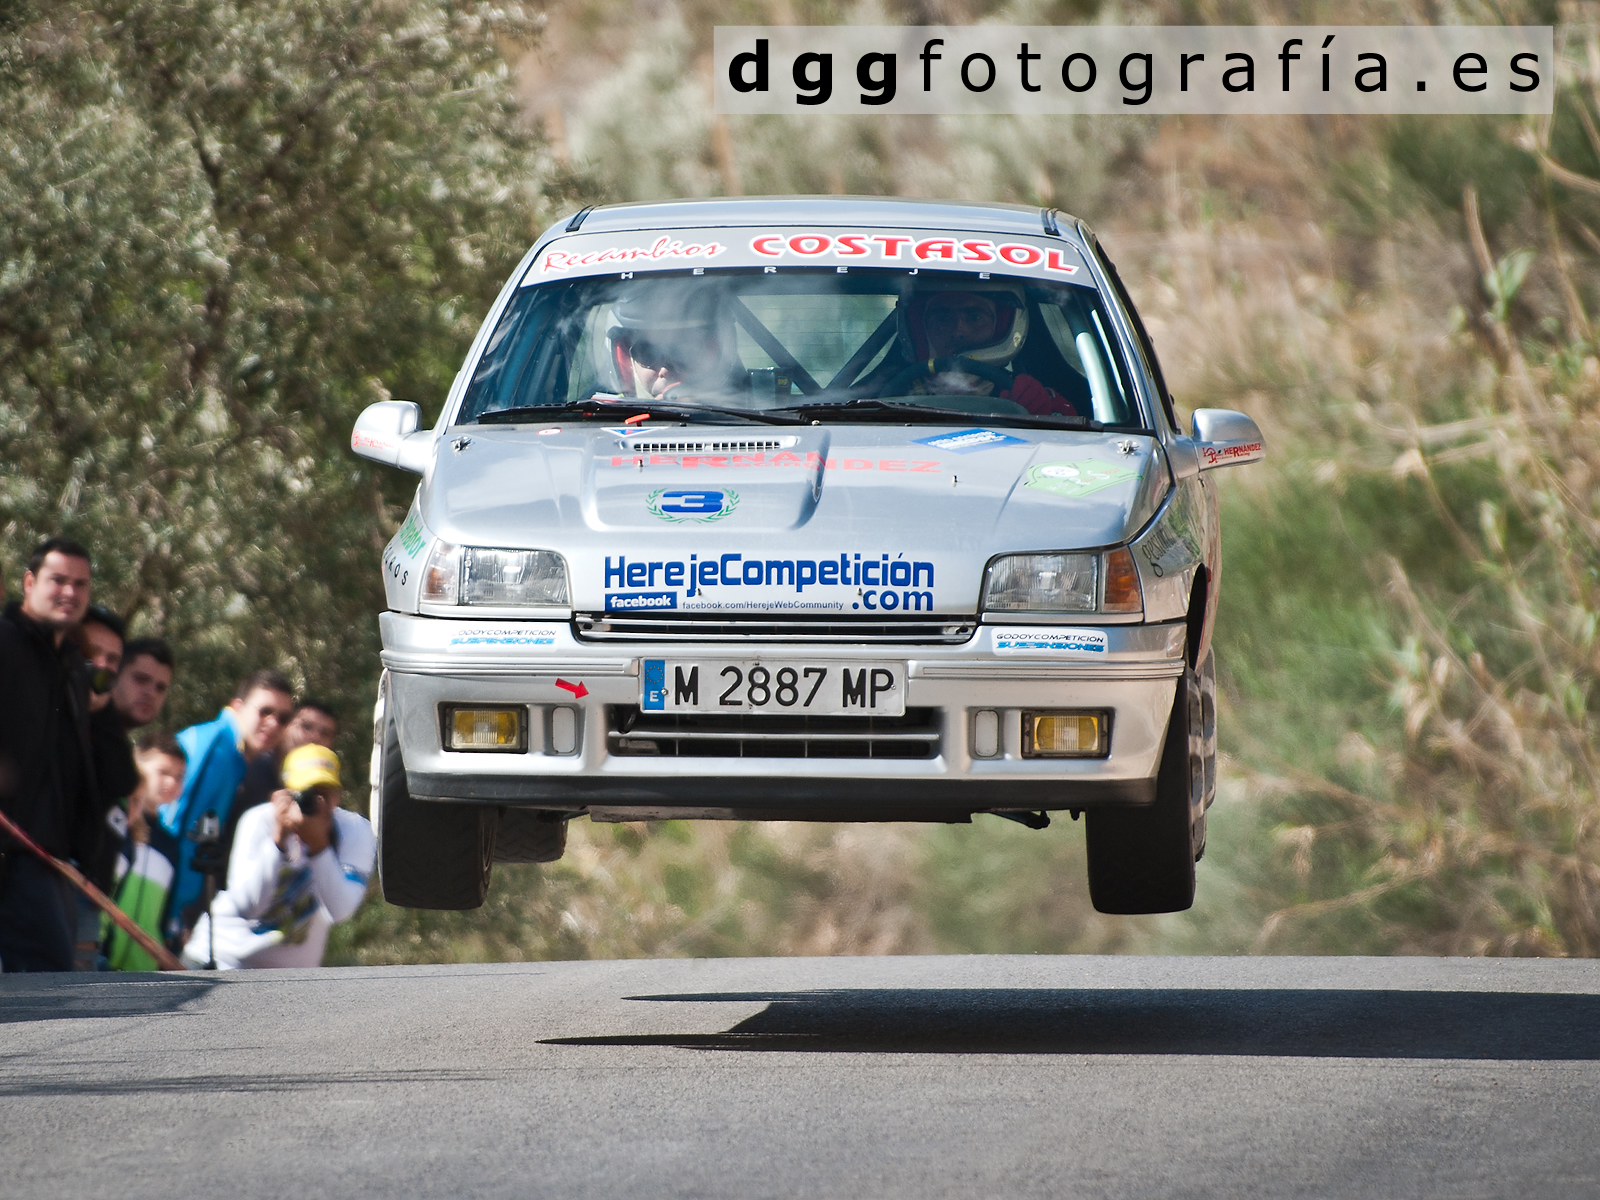 044_dggfotografia_RallySprint Ugijar 12